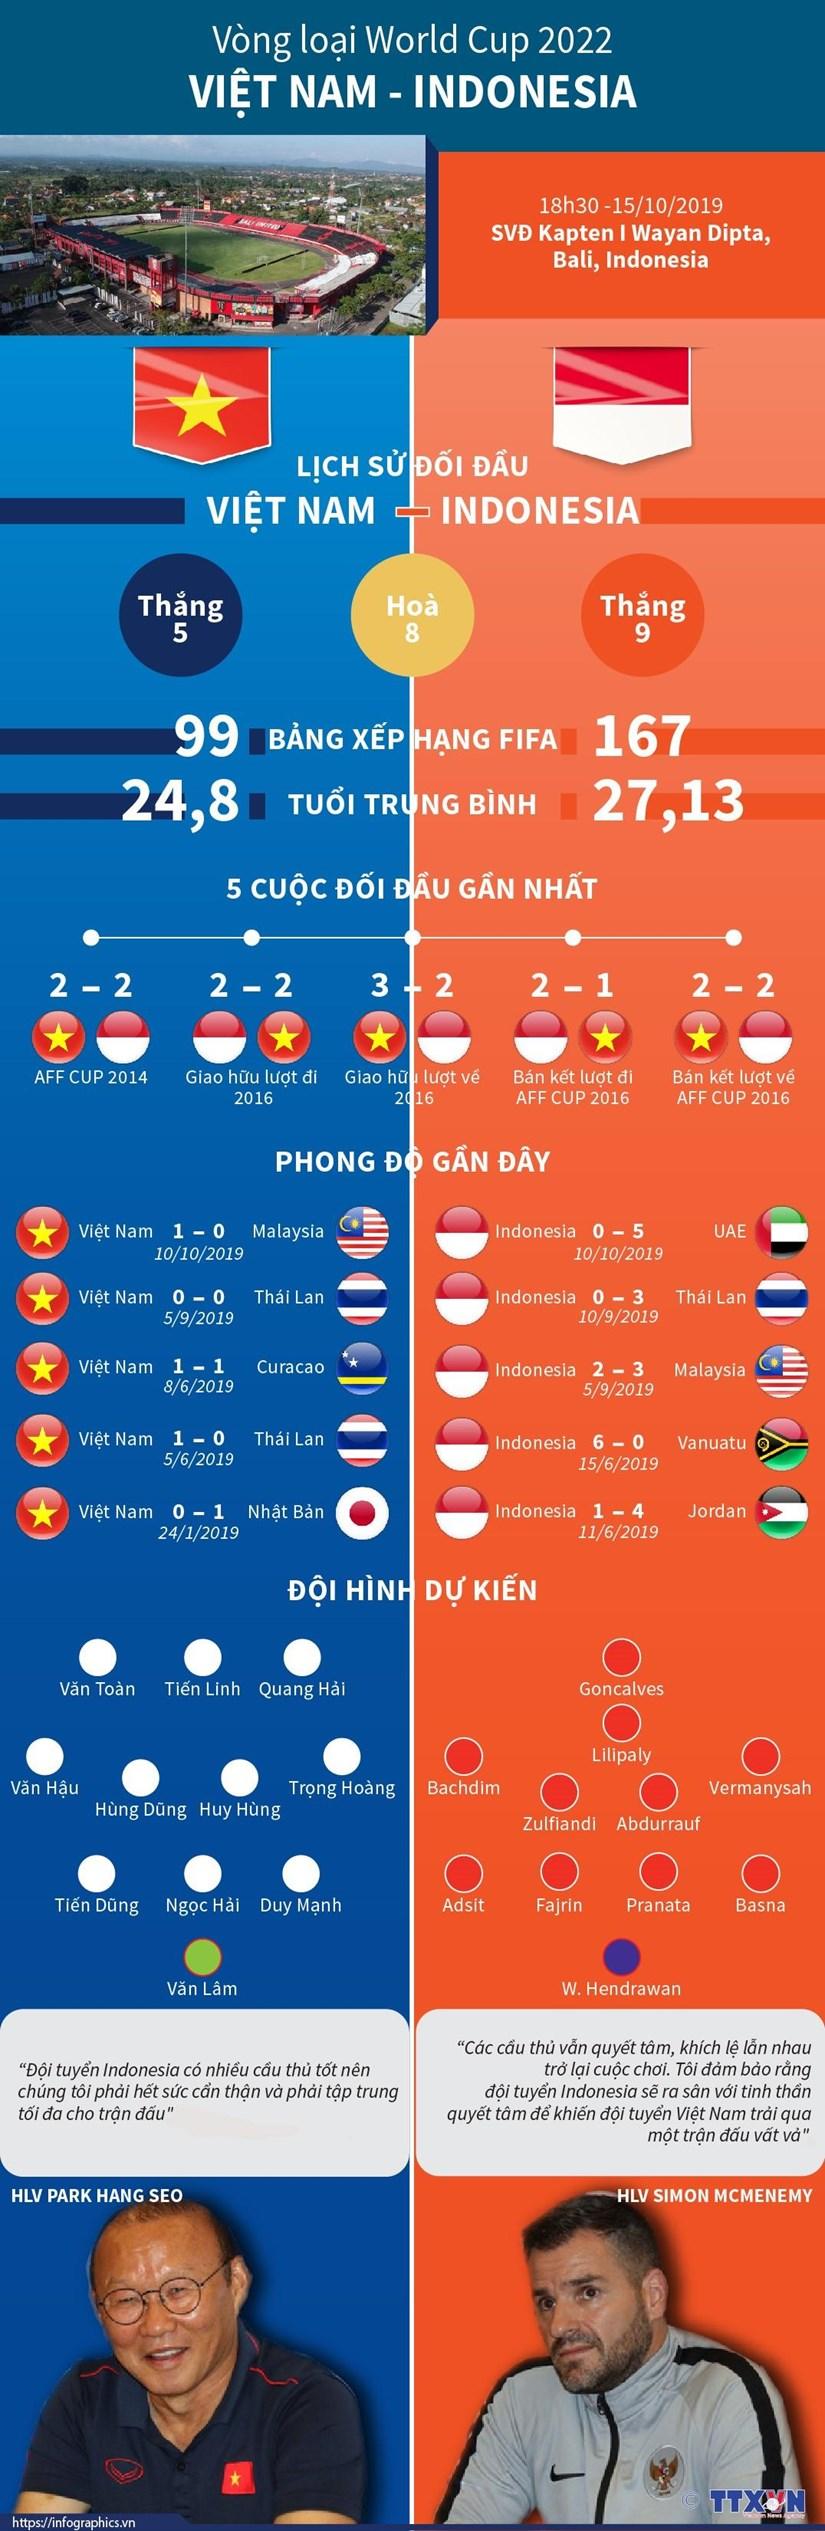 Indonesia-Viet Nam: Co hoi lon cho thay tro HLV Park Hang-seo hinh anh 1